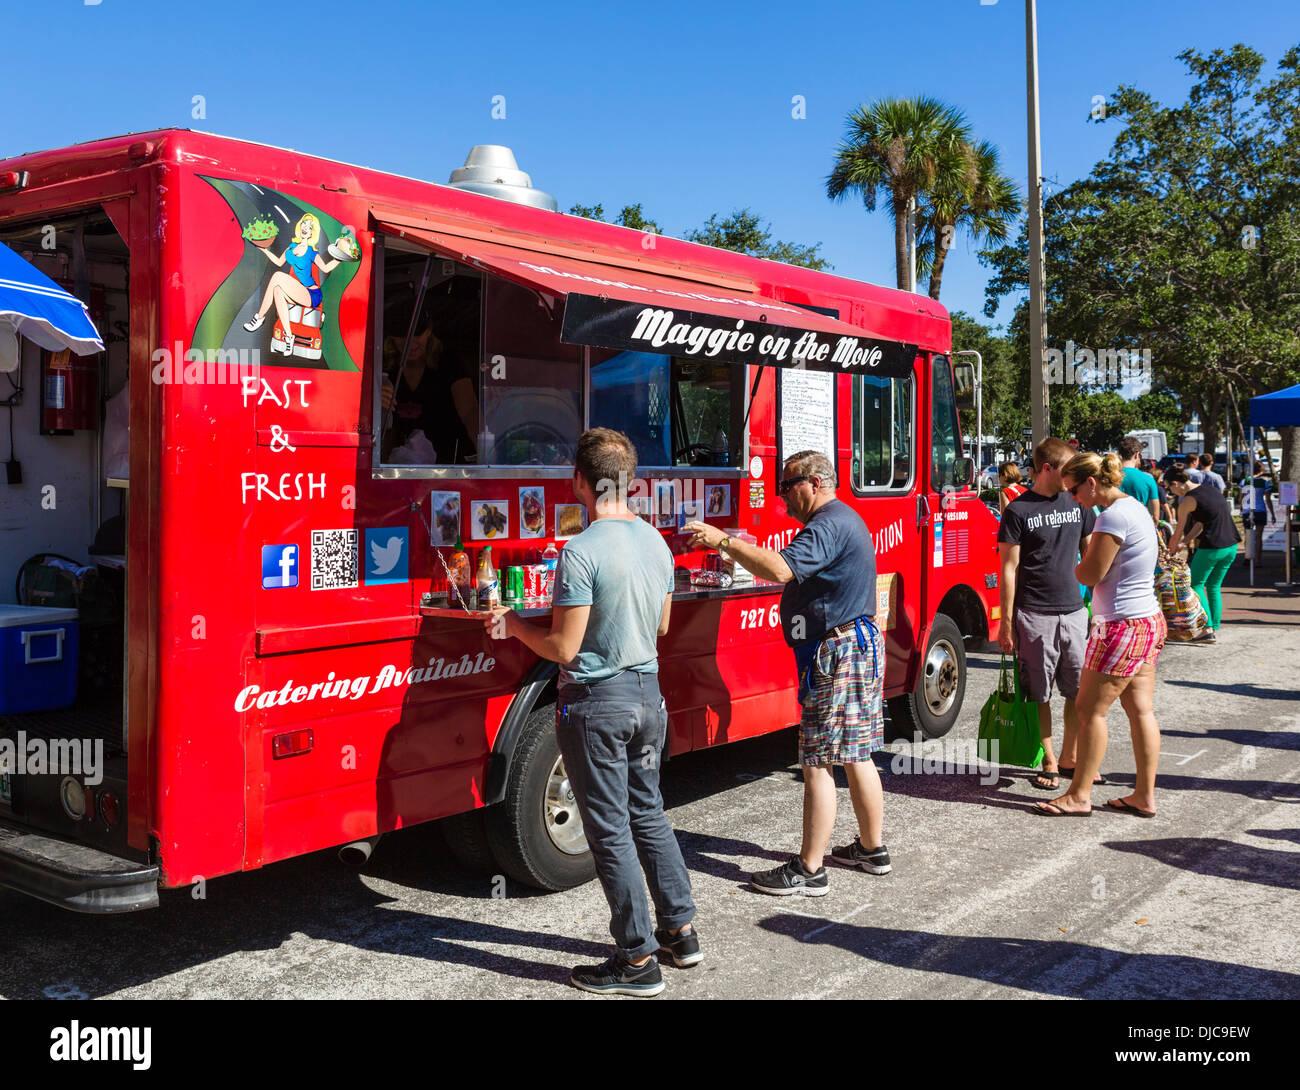 Fast food truck at the Saturday morning market, Progress Energy Park, St Petersburg, Florida, USA - Stock Image